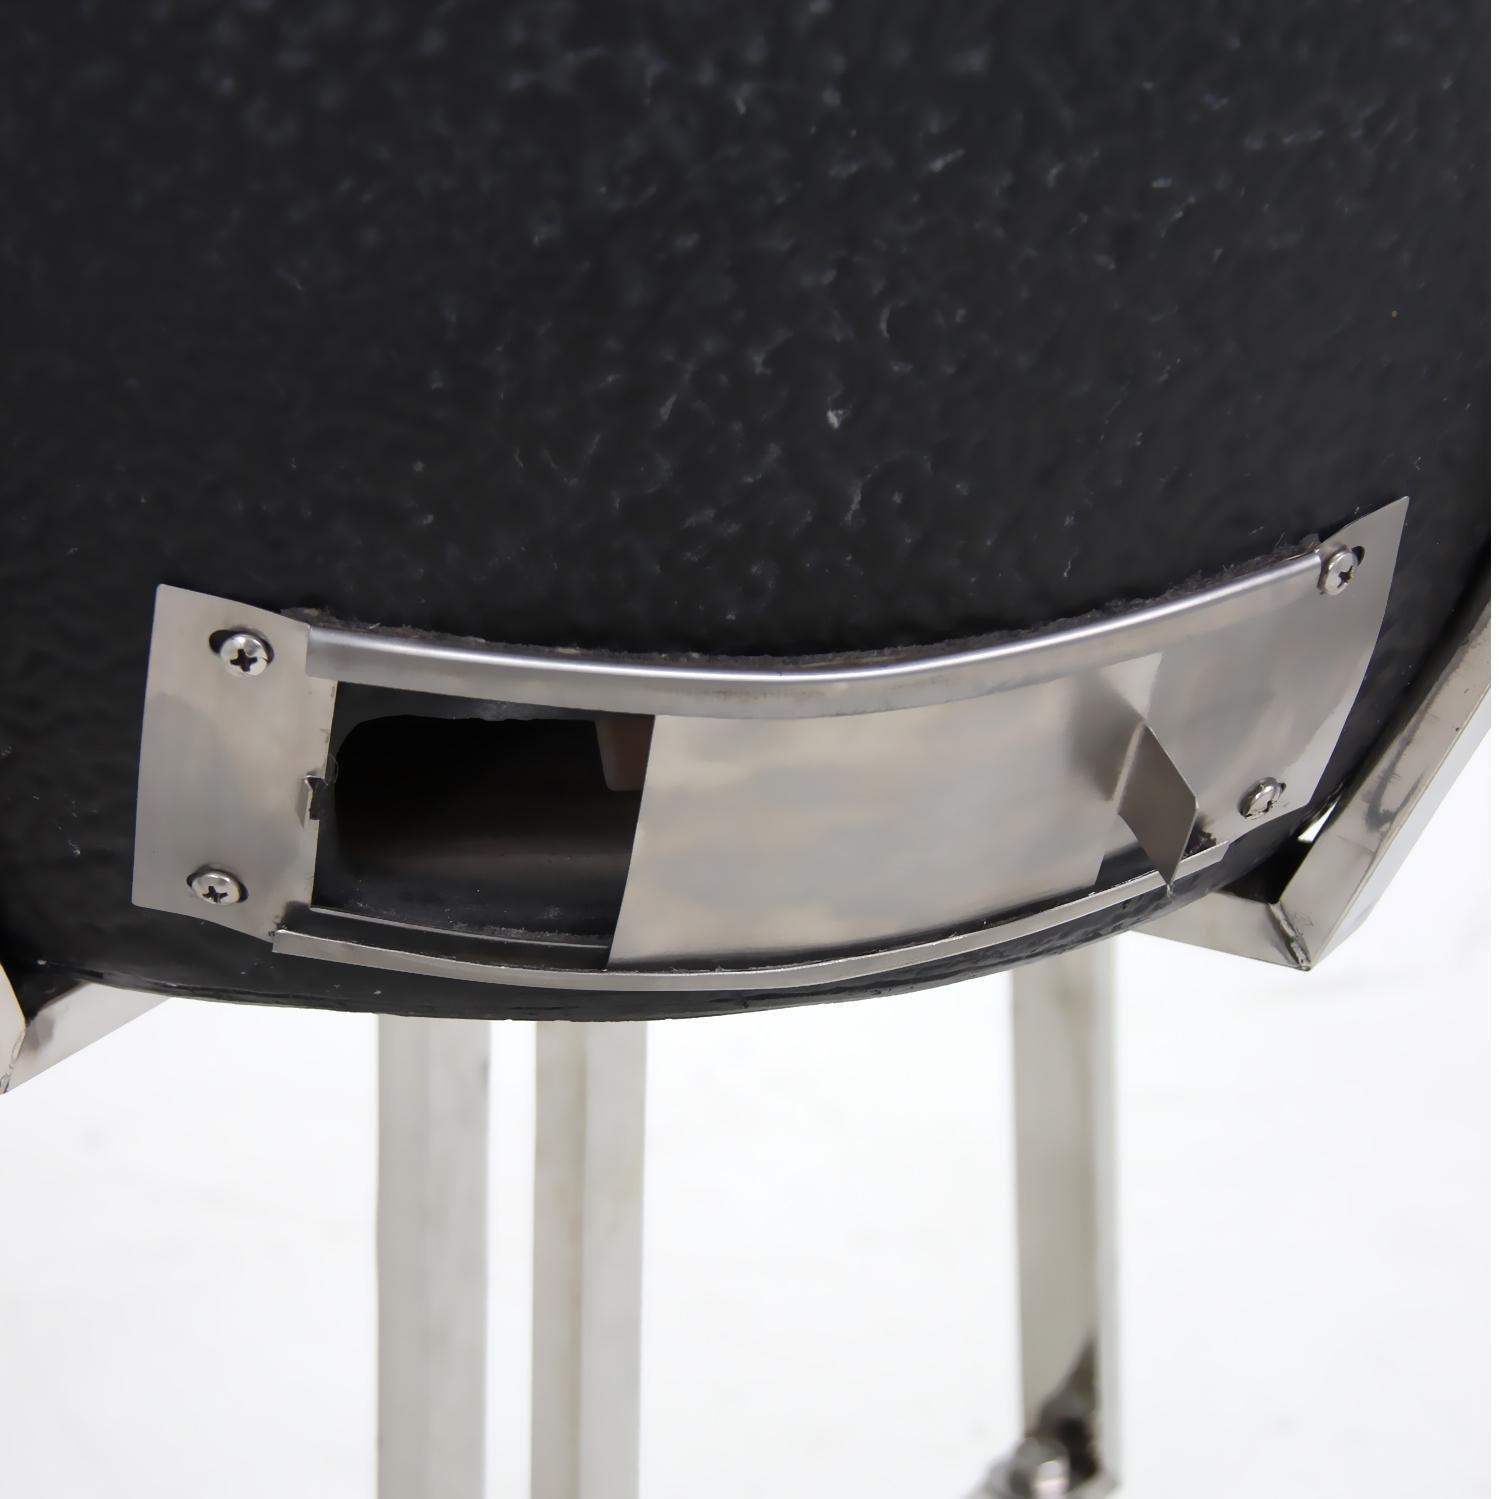 amazon com profire bravo kamado ceramic grill on cart black